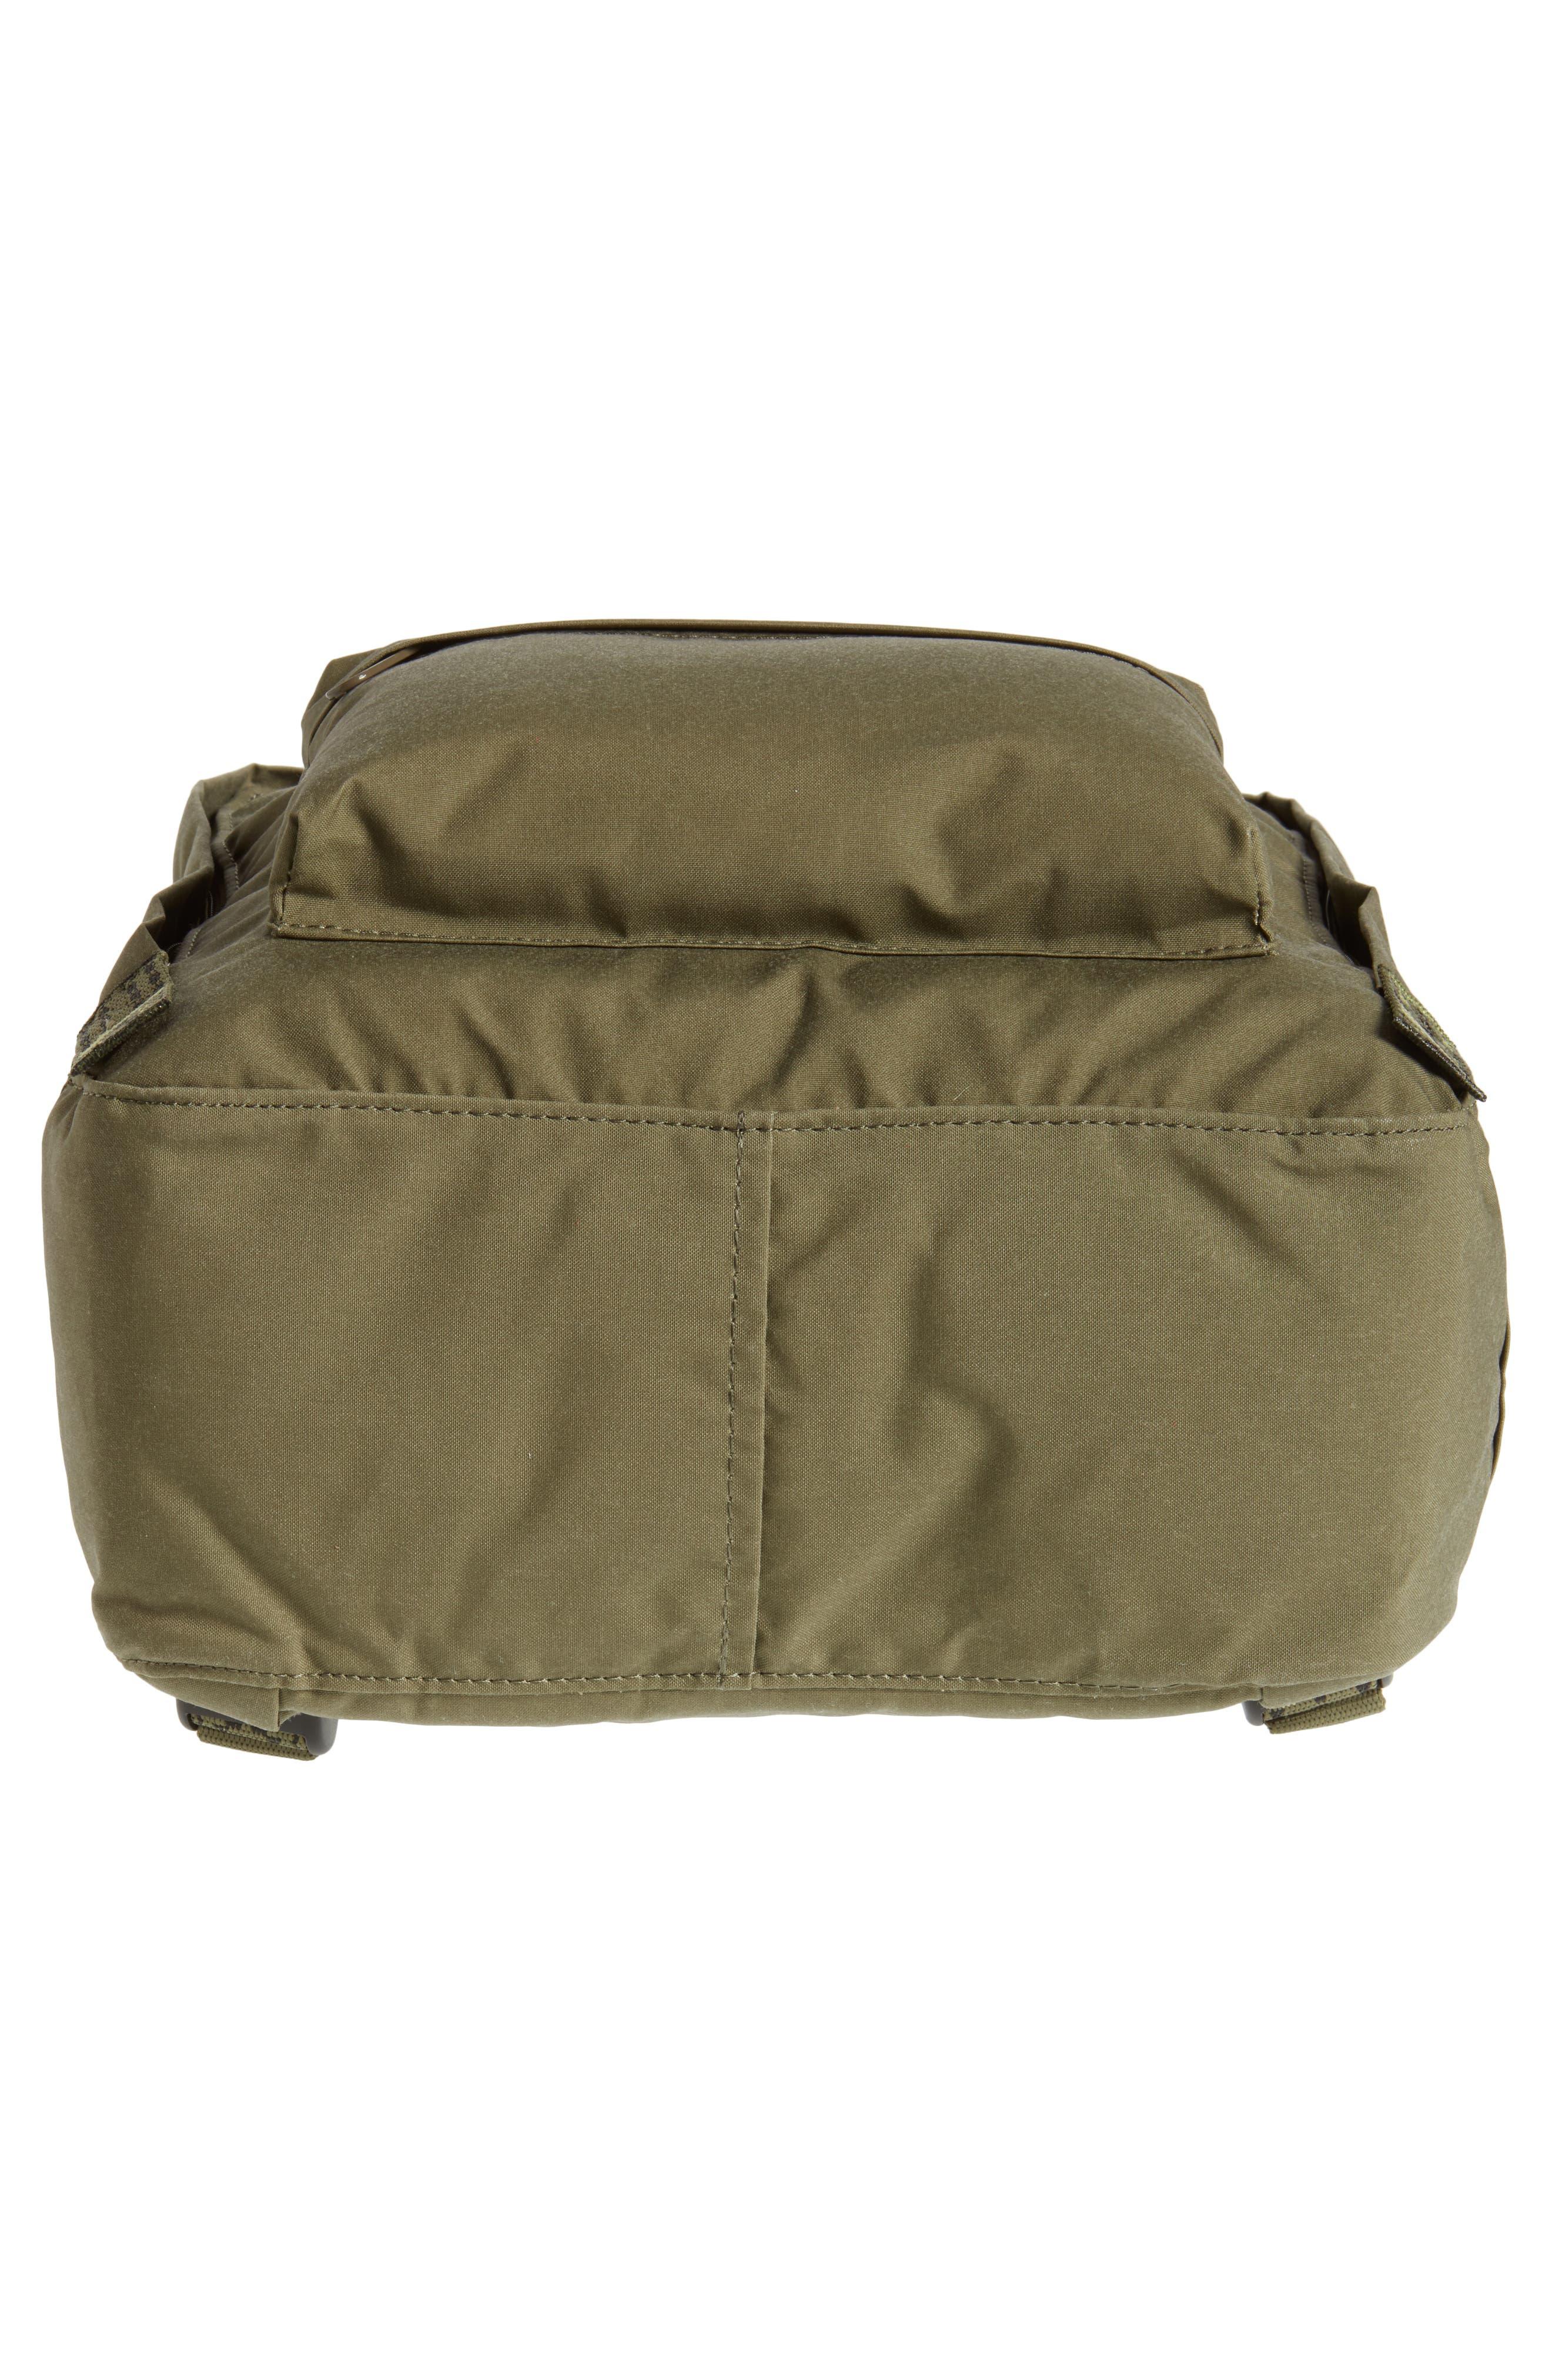 'Kånken' Water Resistant Backpack,                             Alternate thumbnail 350, color,